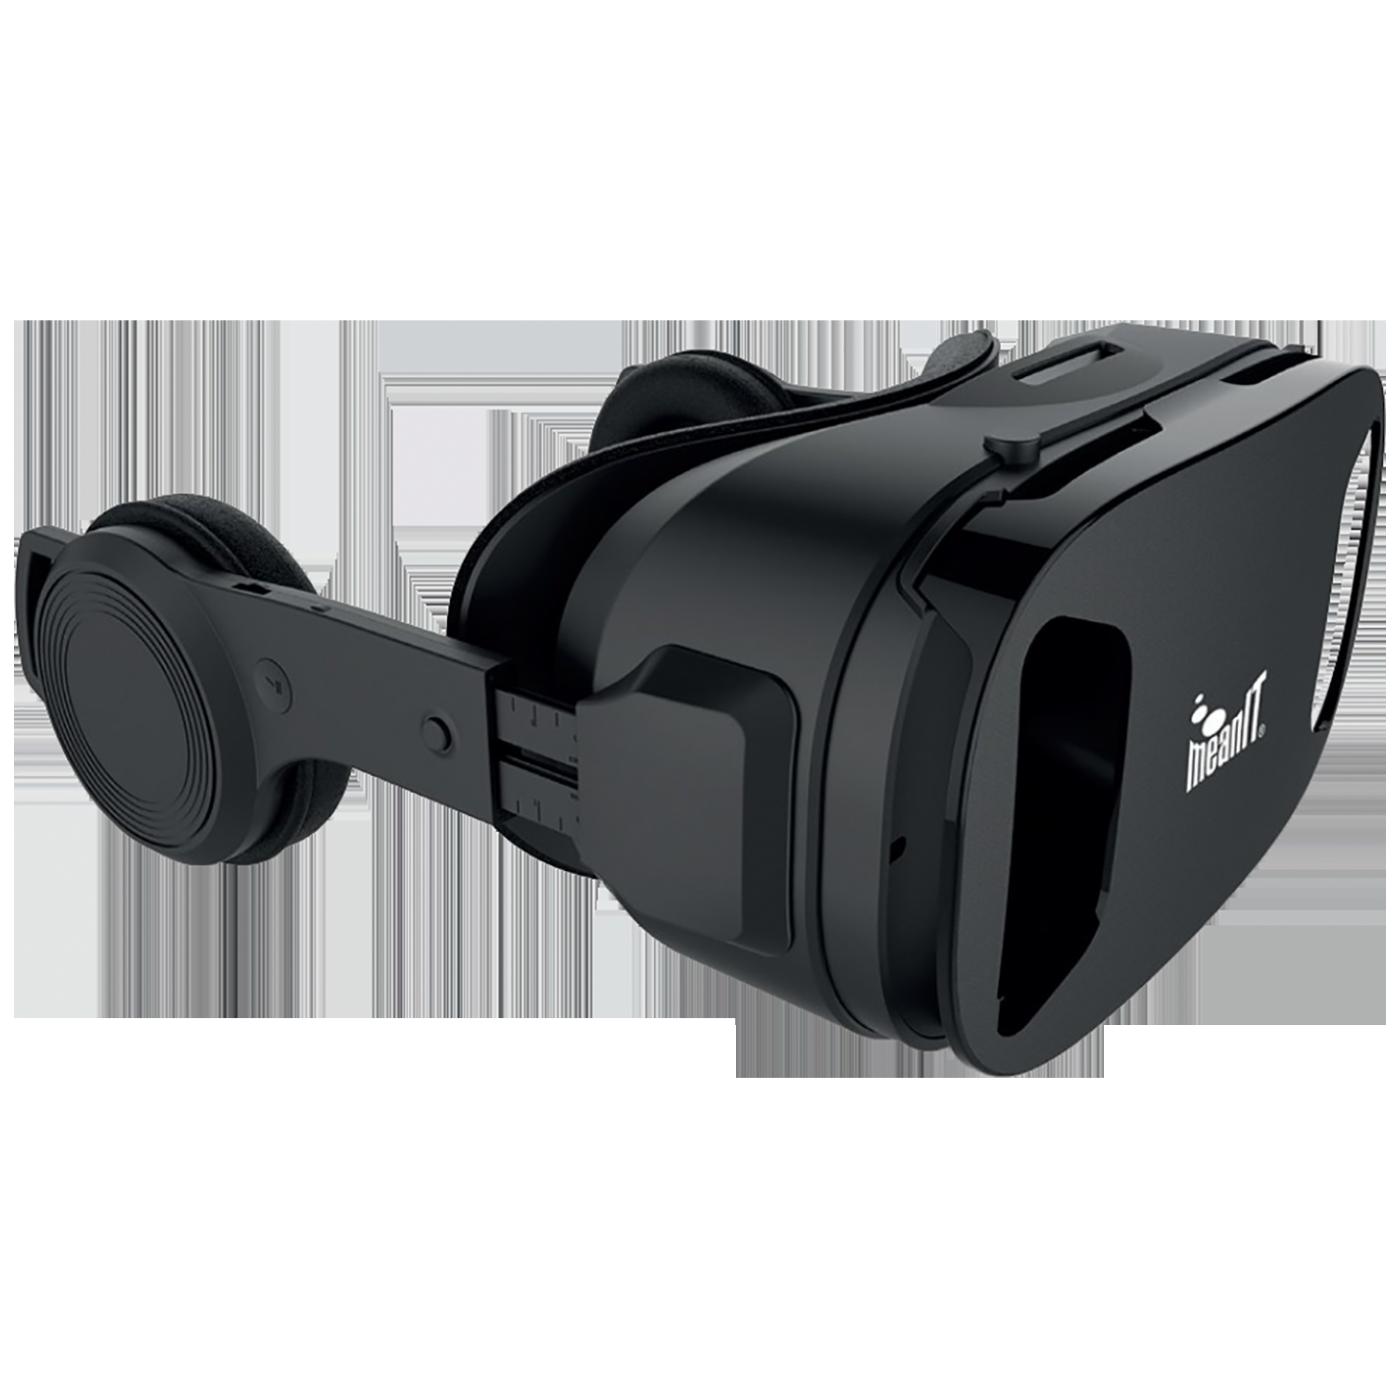 Virtualne naočale za smartphone sa akc.tipkom+slušalice